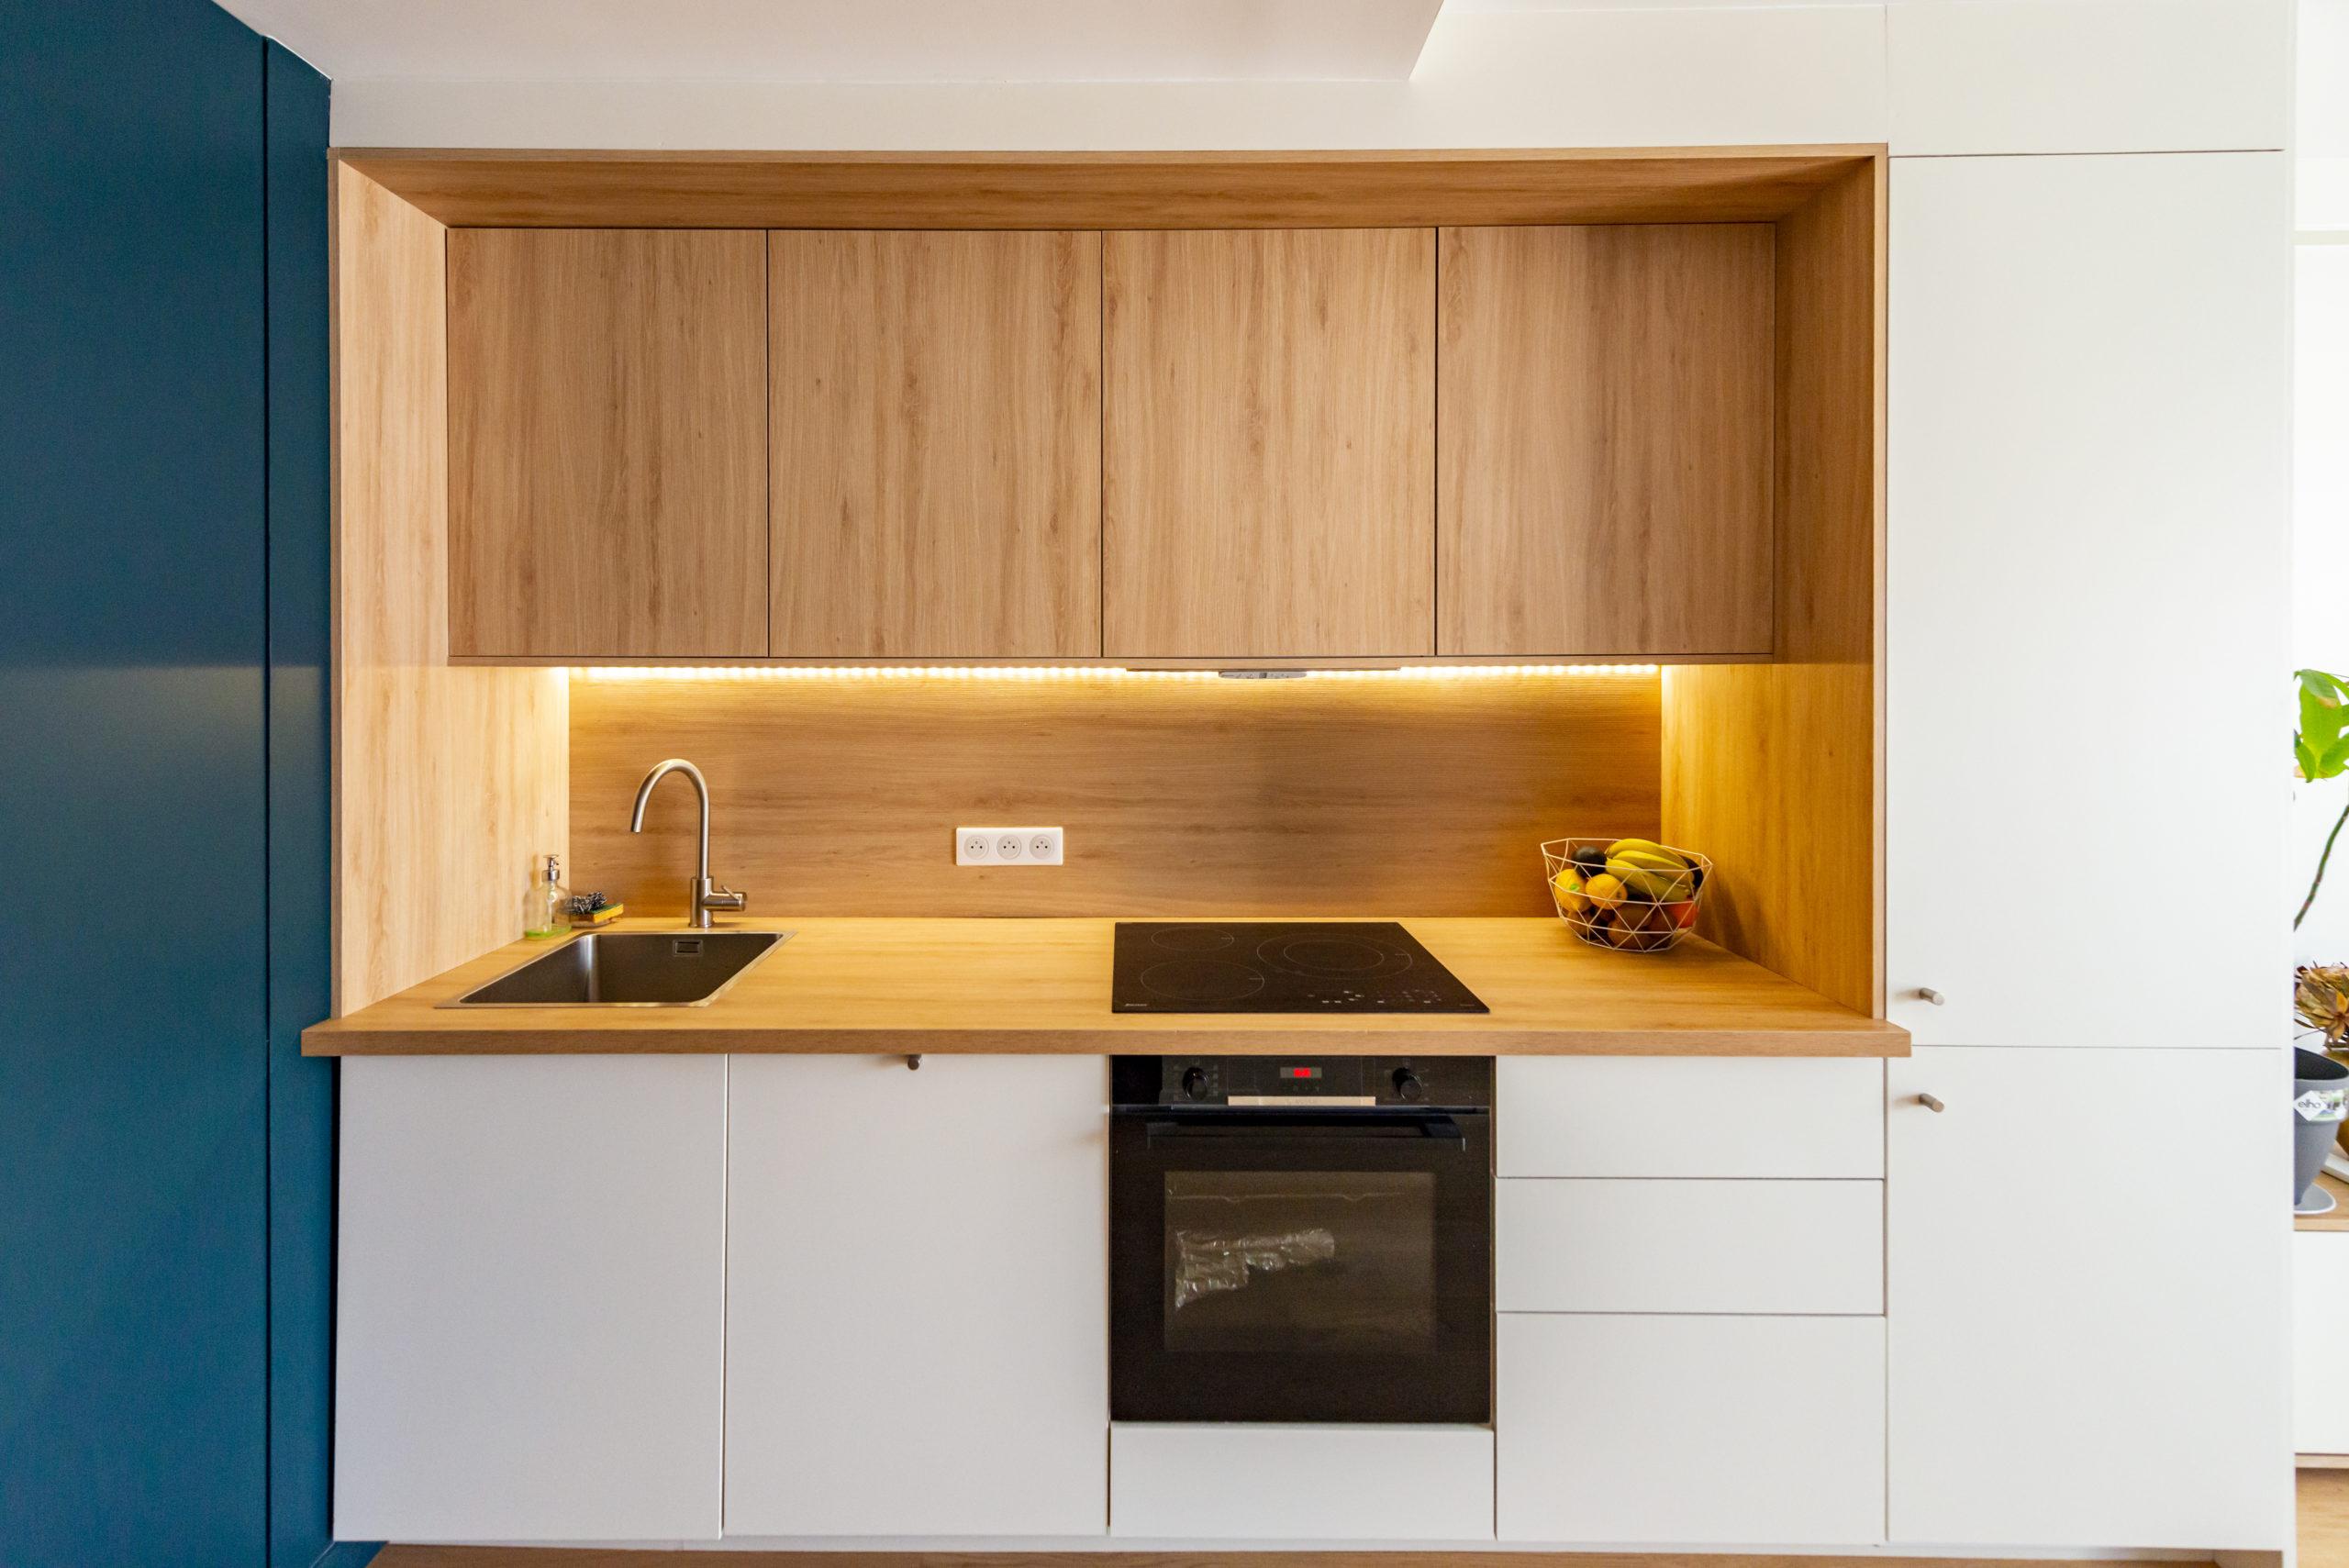 05-renovation-cuisine